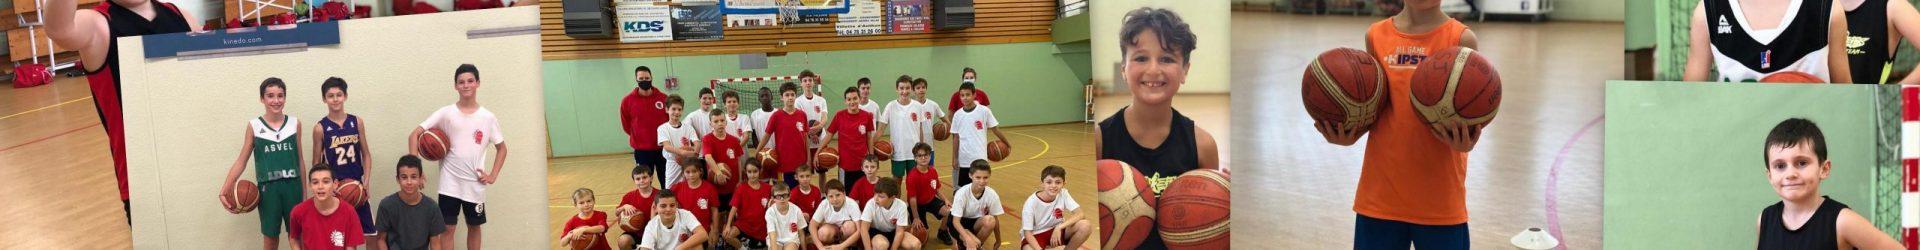 [Photos] Stage ESJ Basket d'Automne 2020